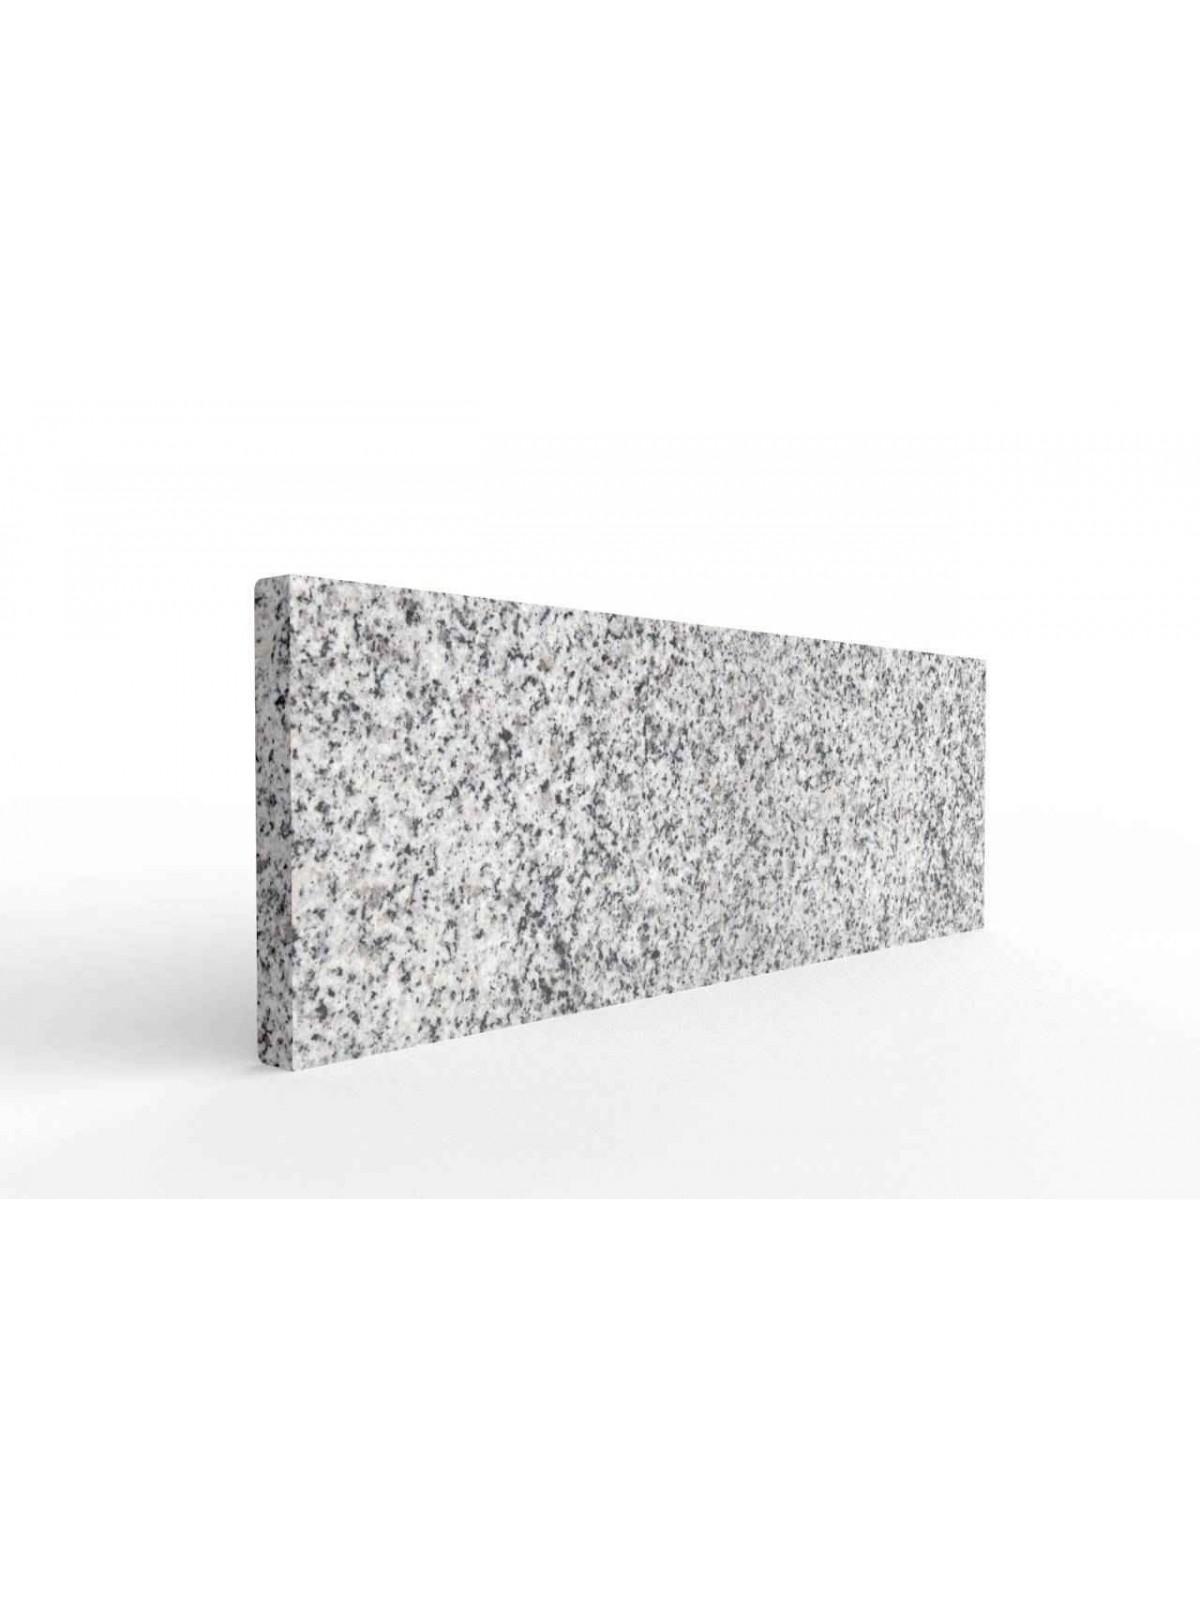 Granit Sockelleiste I Diorit Hell